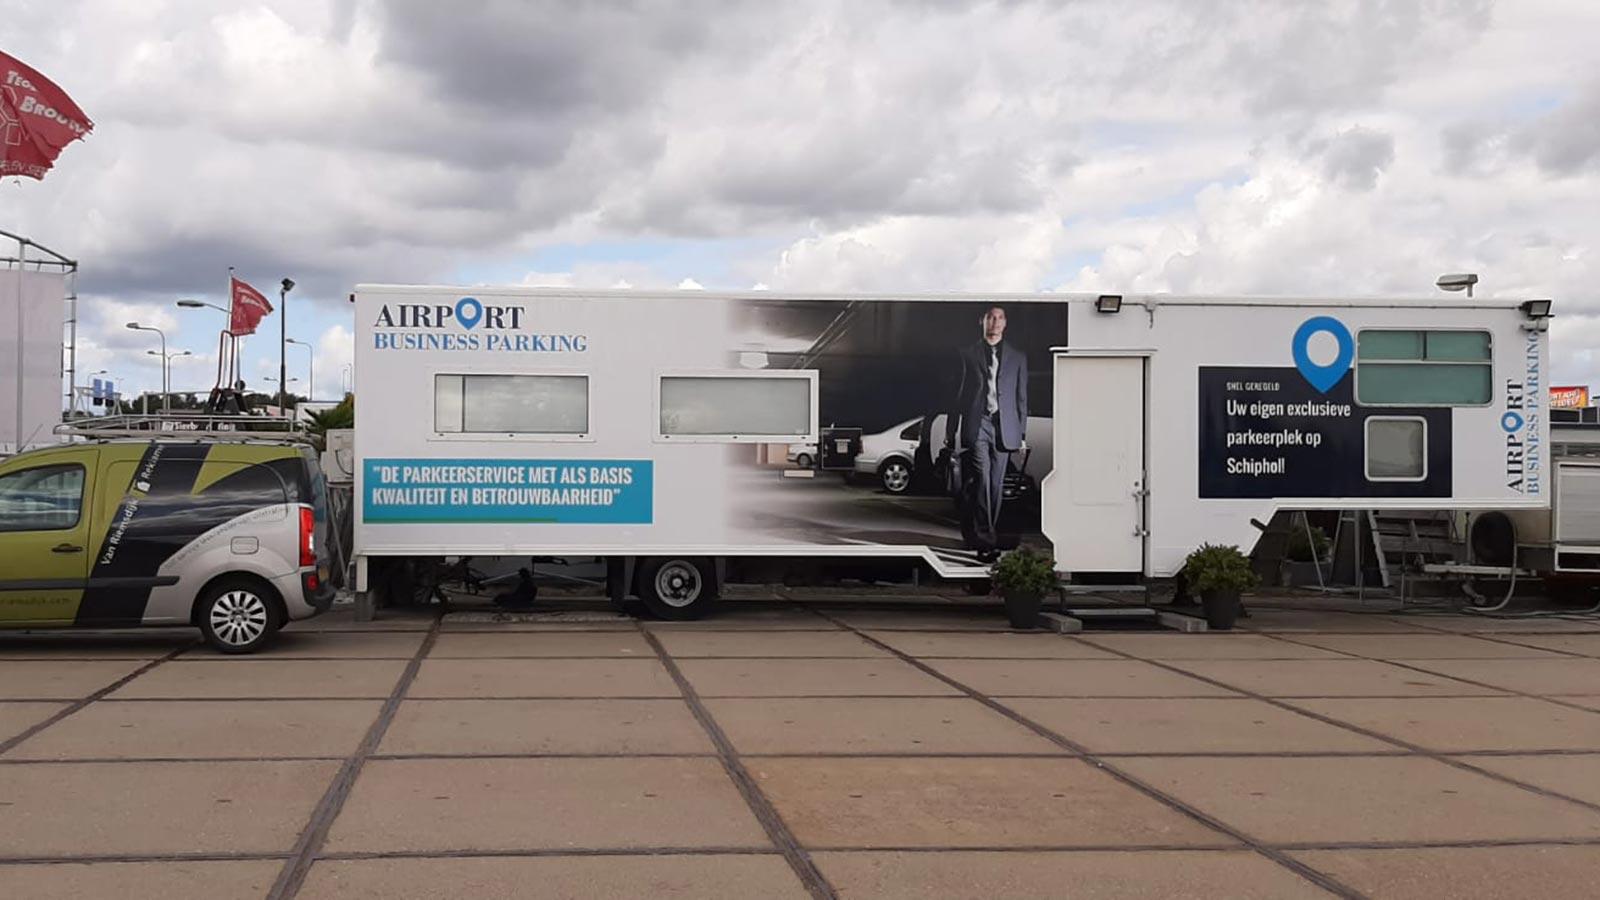 Van Riemsdijk Reklame - Buitenreklame - Airport Business Parking